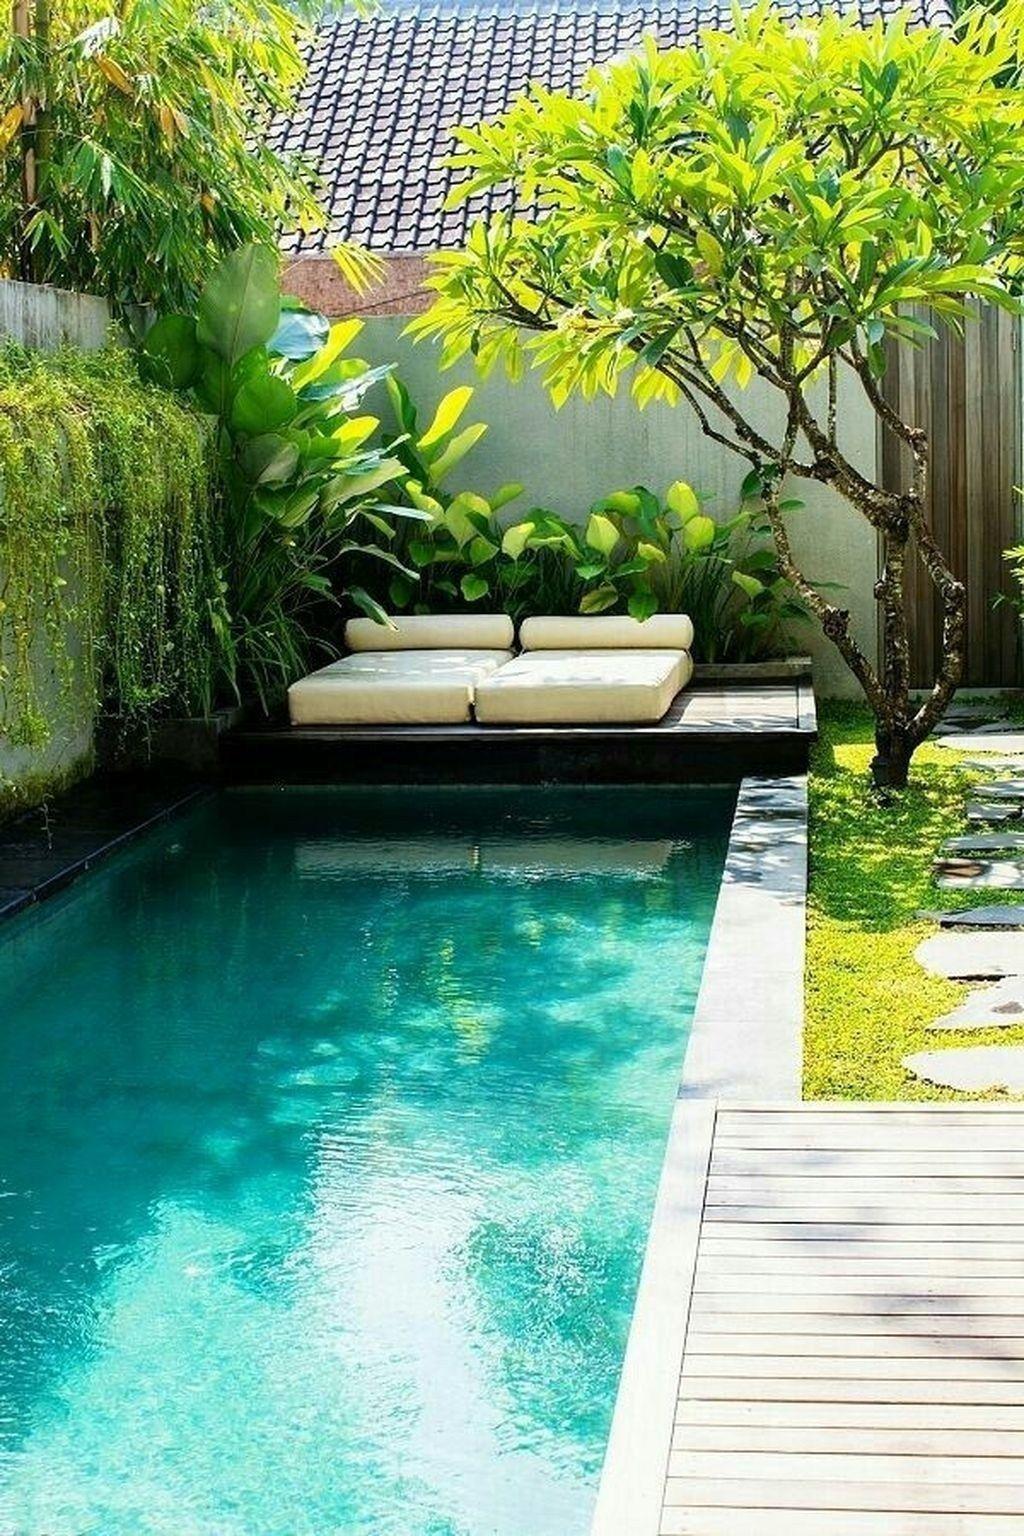 15 Popular Swimming Pool Garden Design Ideas Small Pool Design Outdoor Gardens Design Backyard Landscaping Designs